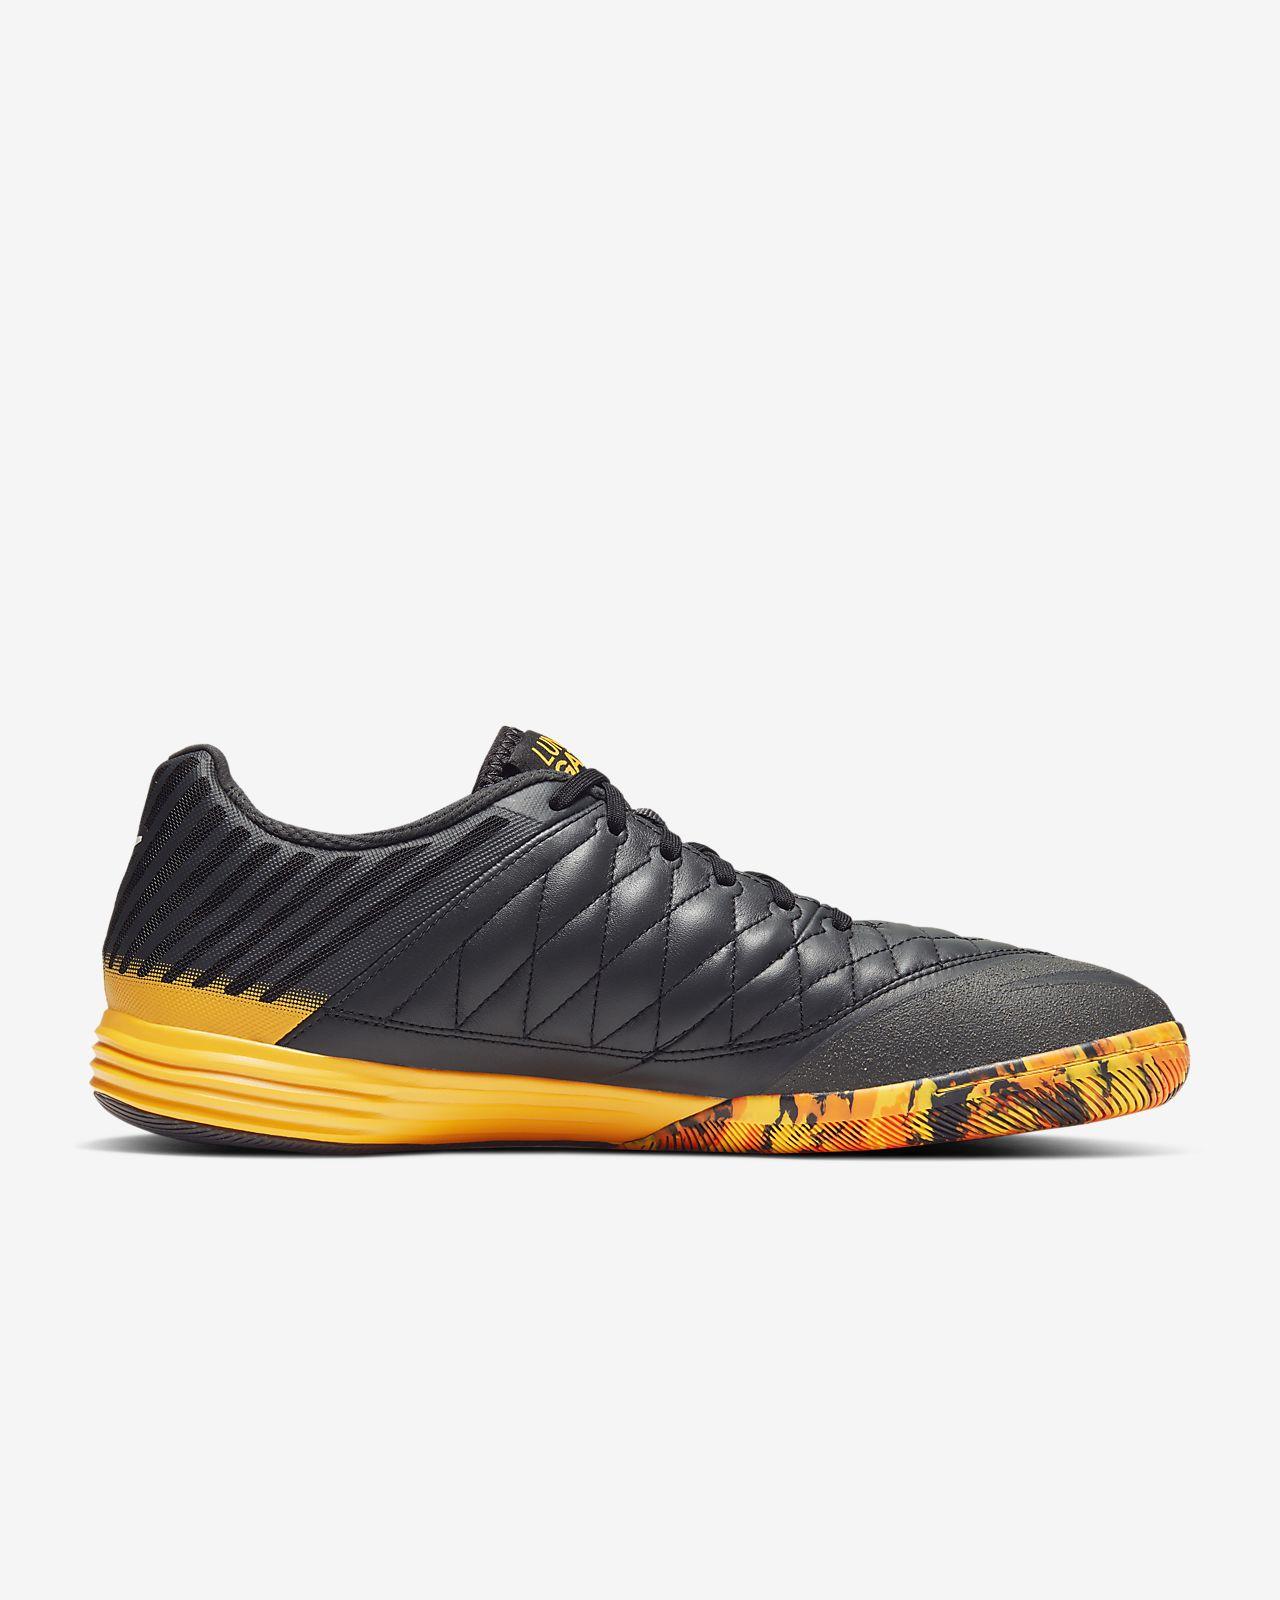 Sapatilhas Nike LunarGato II